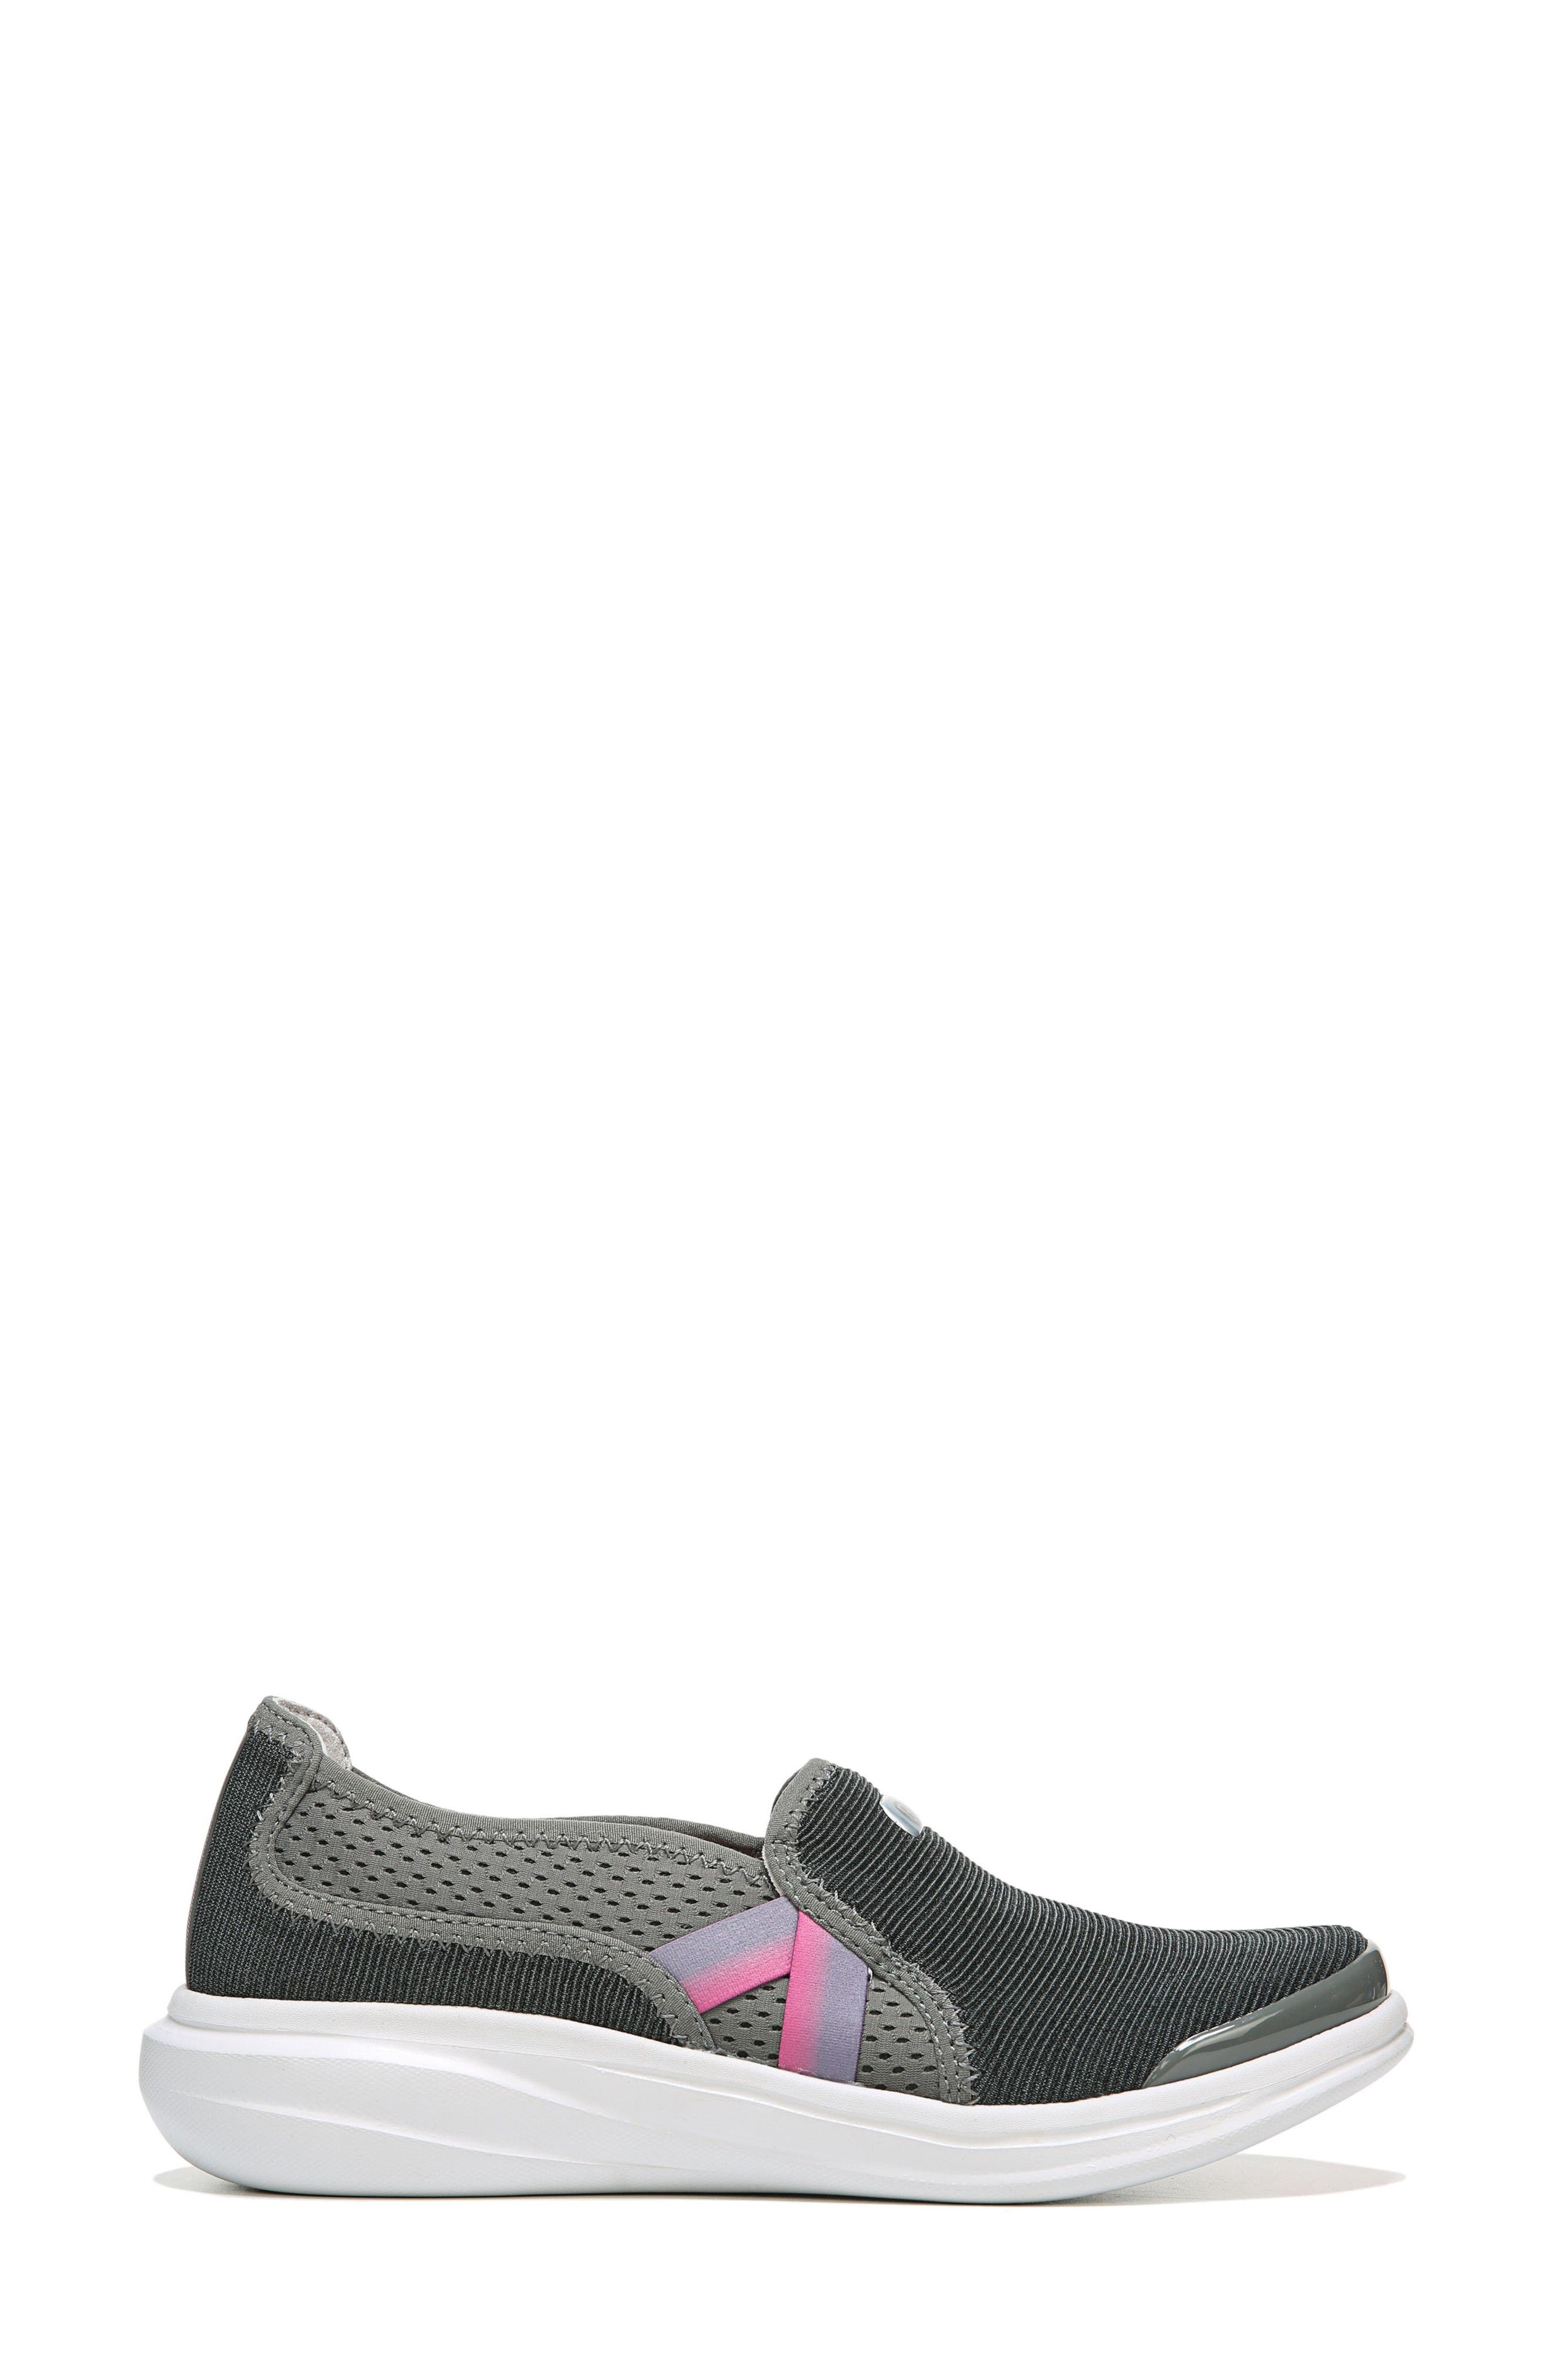 Cruise Slip-On Sneaker,                             Alternate thumbnail 3, color,                             DARK GREY FABRIC